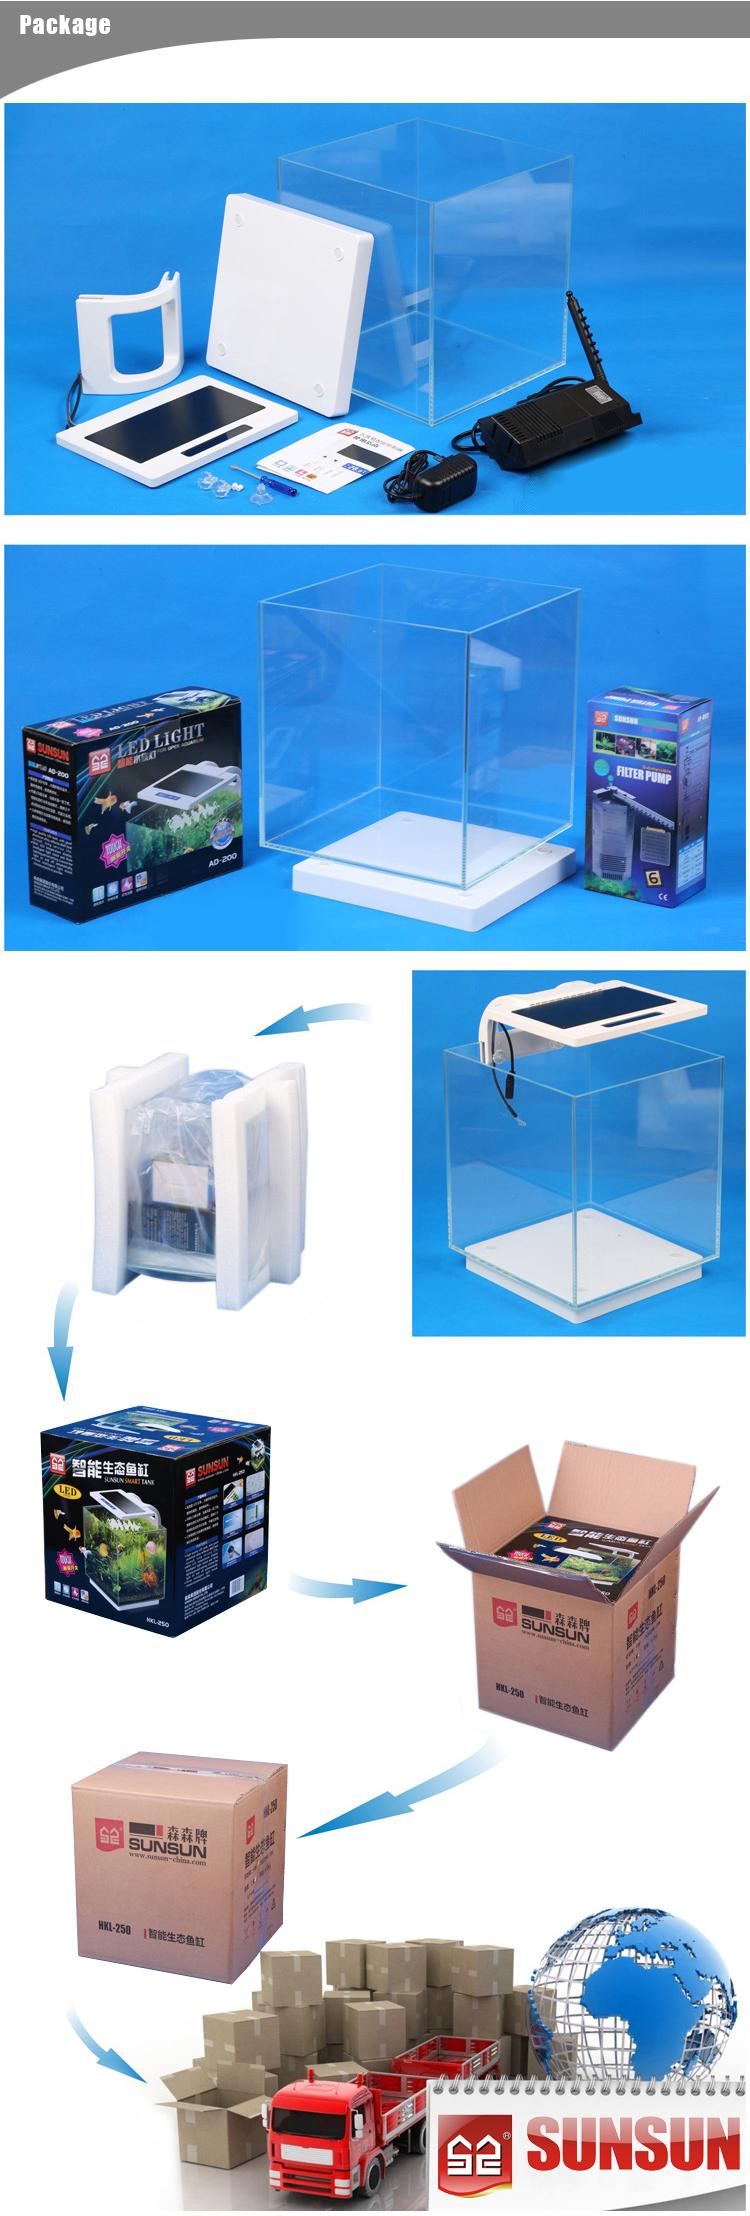 Sunsun g 25 led plastic acrylic aquarium fish tank price for Acrylic fish tanks for sale